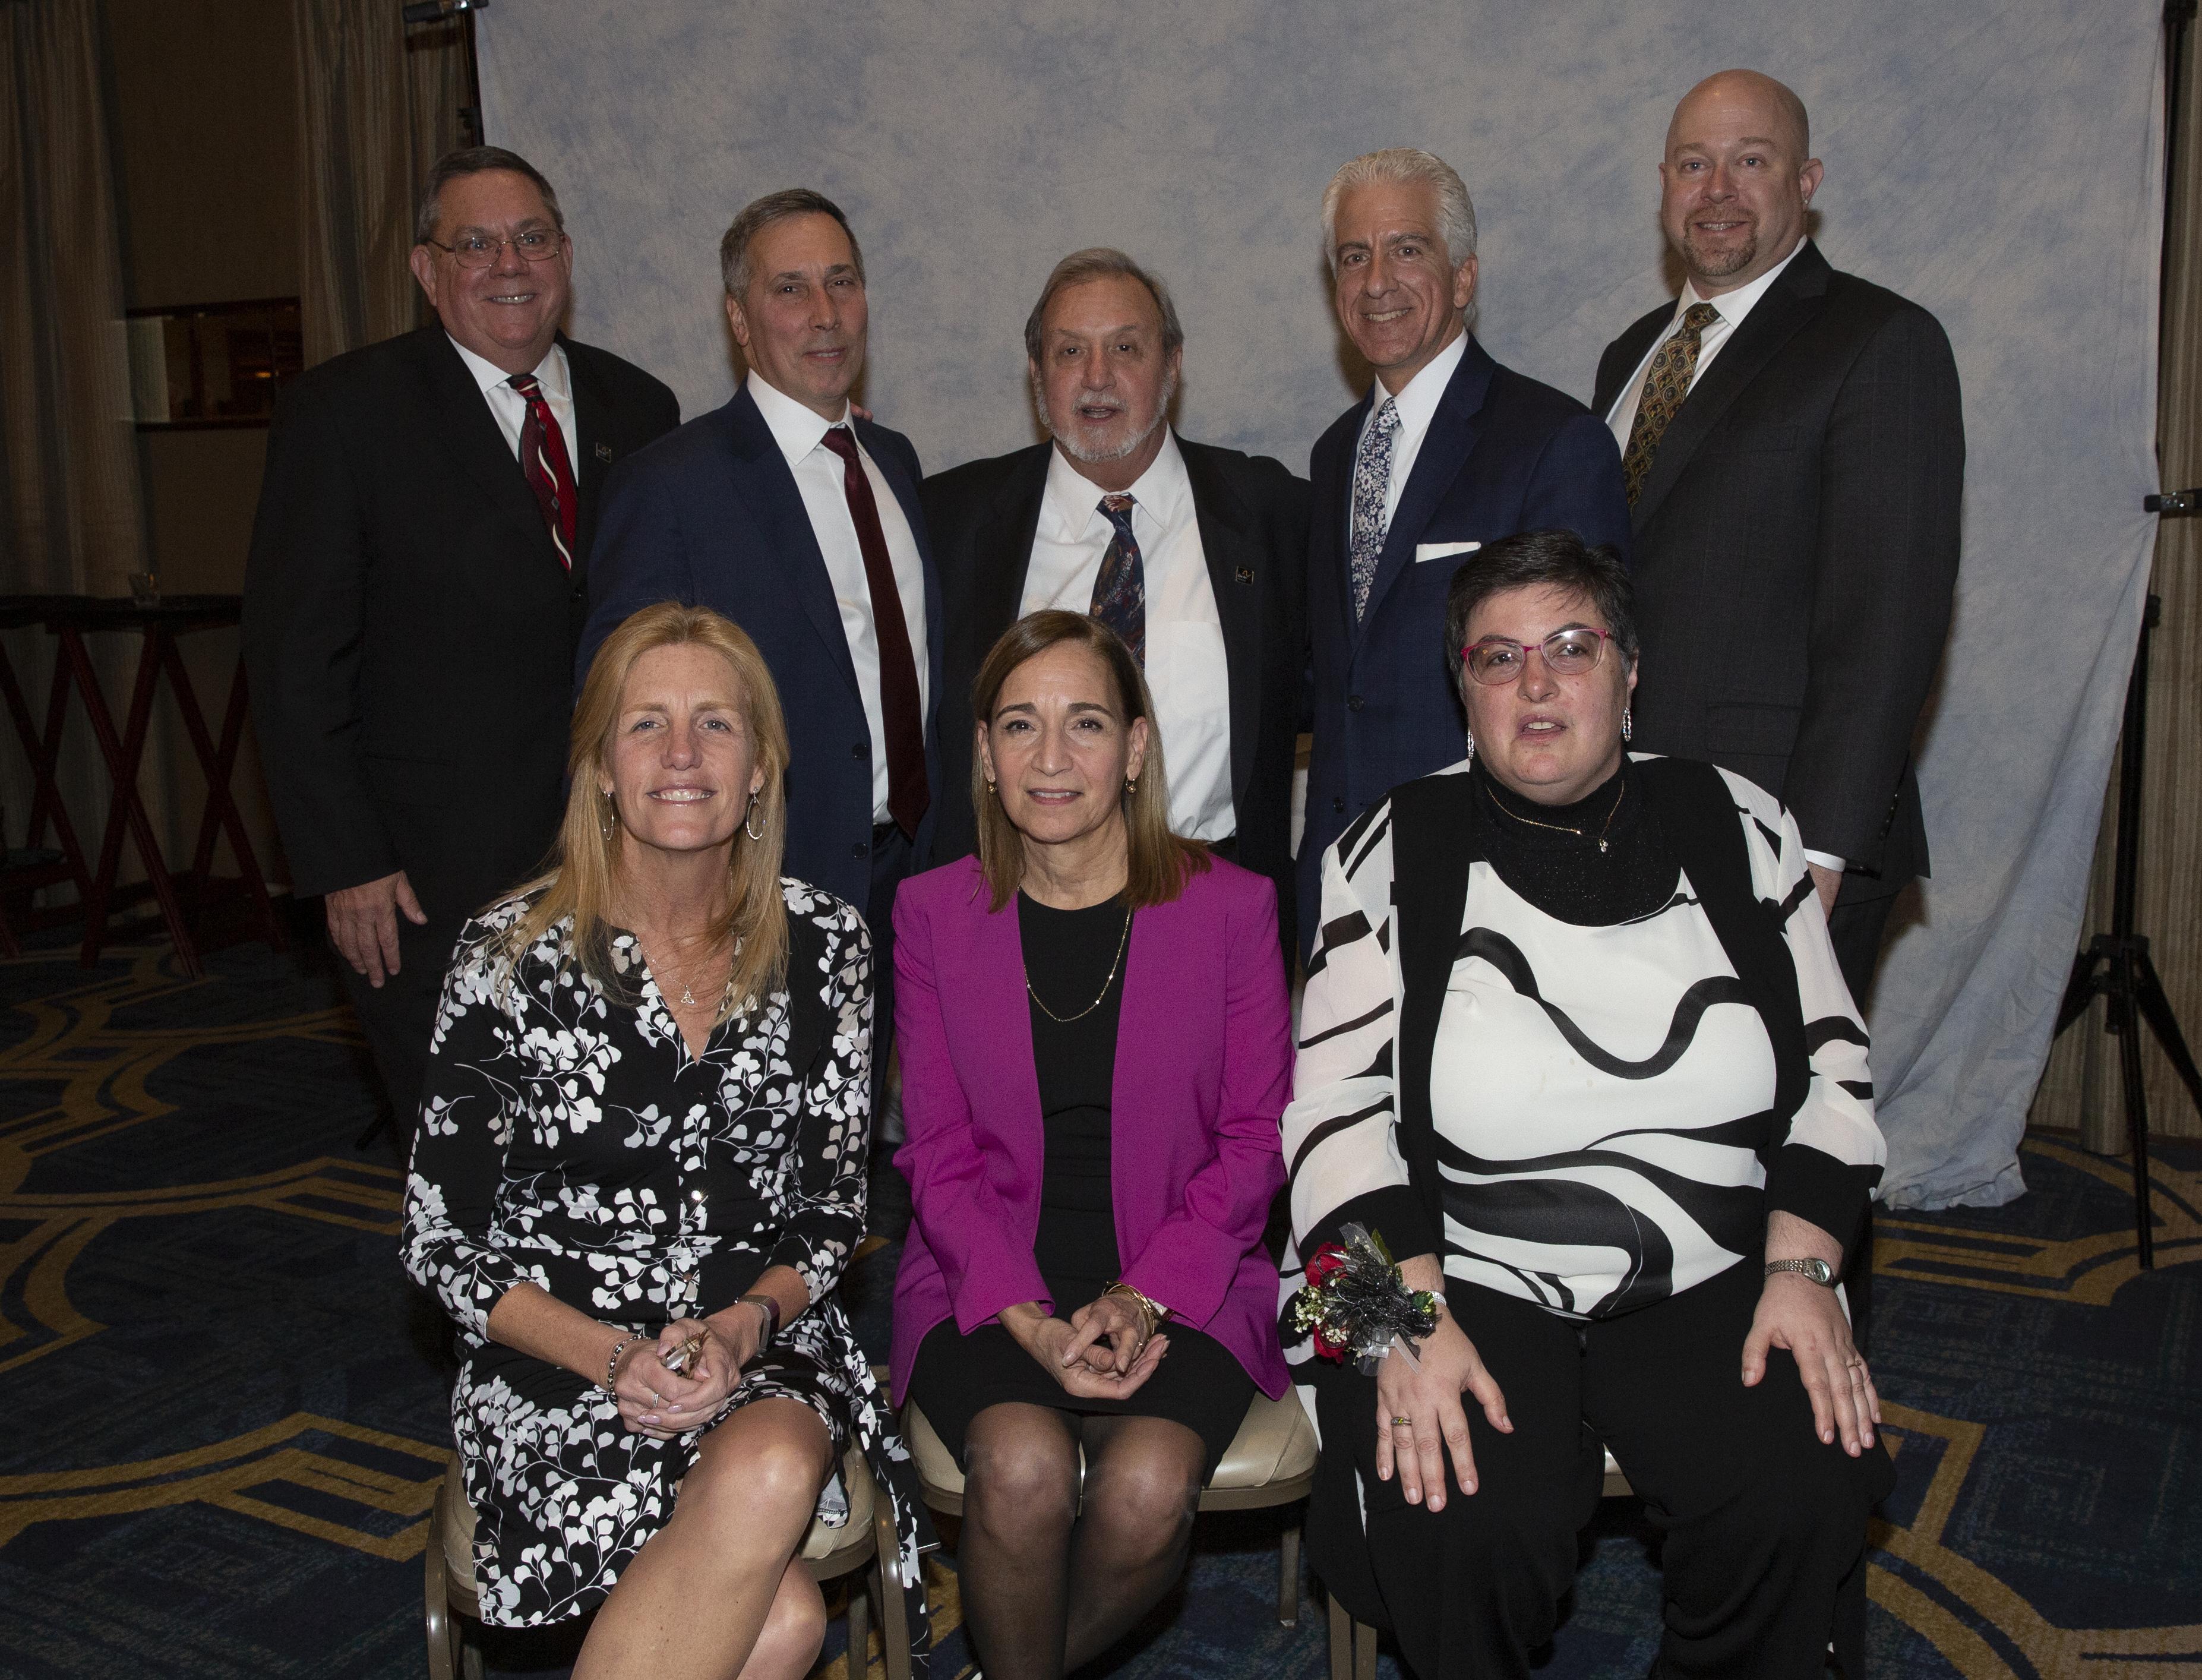 The Arc of NJ's 70th Anniversary